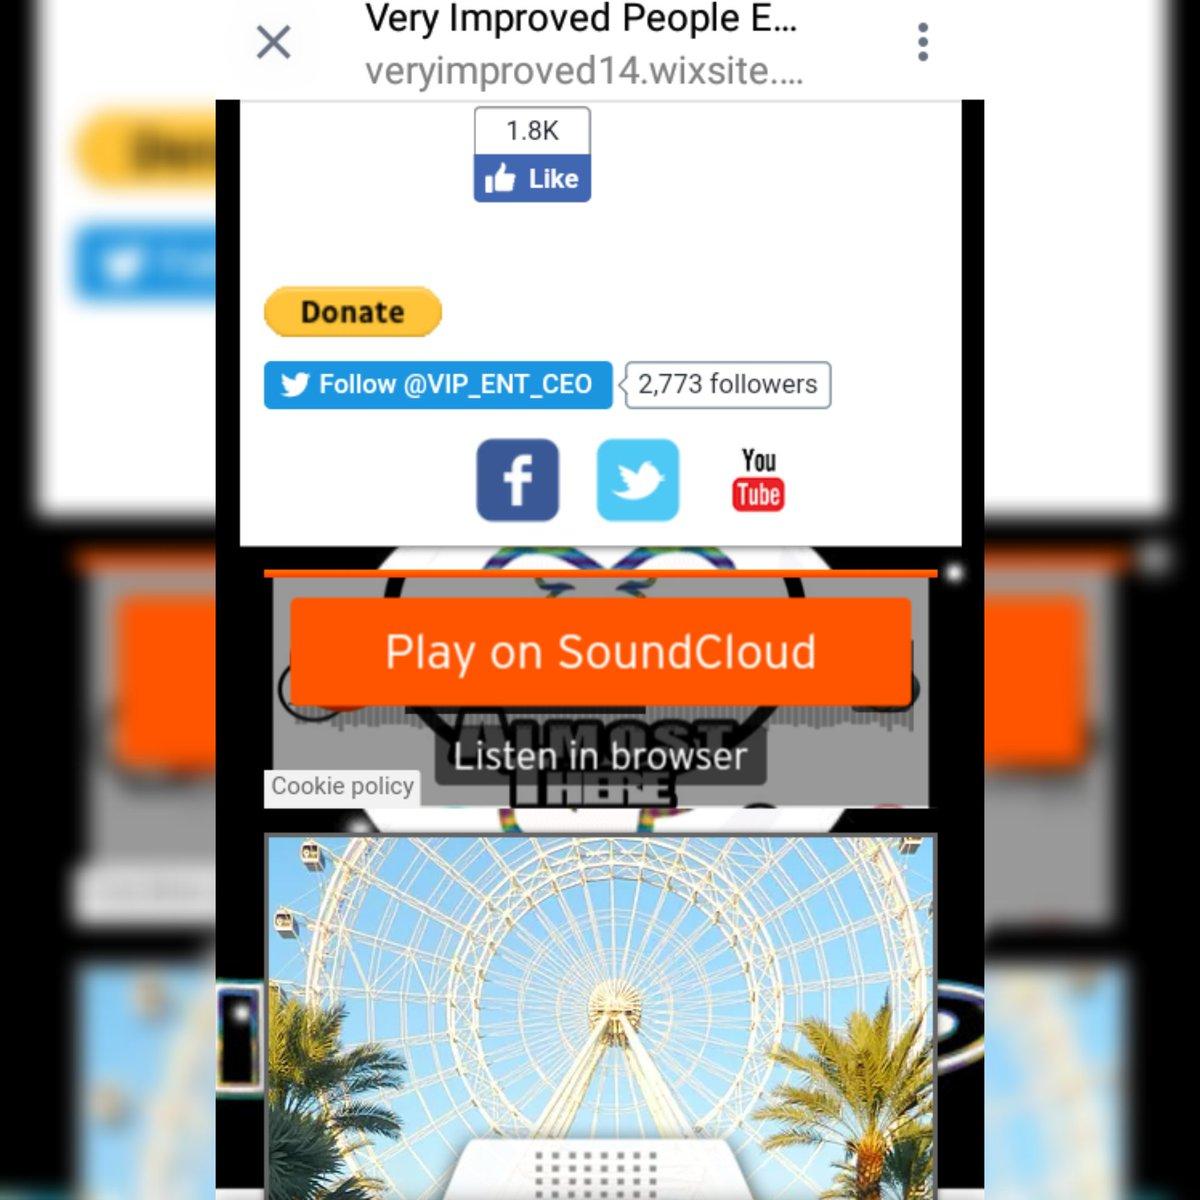 On The Vip Website Veryimproved14 Wix Com Teamvip777 Thegentiletruth Veryimprovedpeopleent Marketing Advertising Duval Va Ga Atl